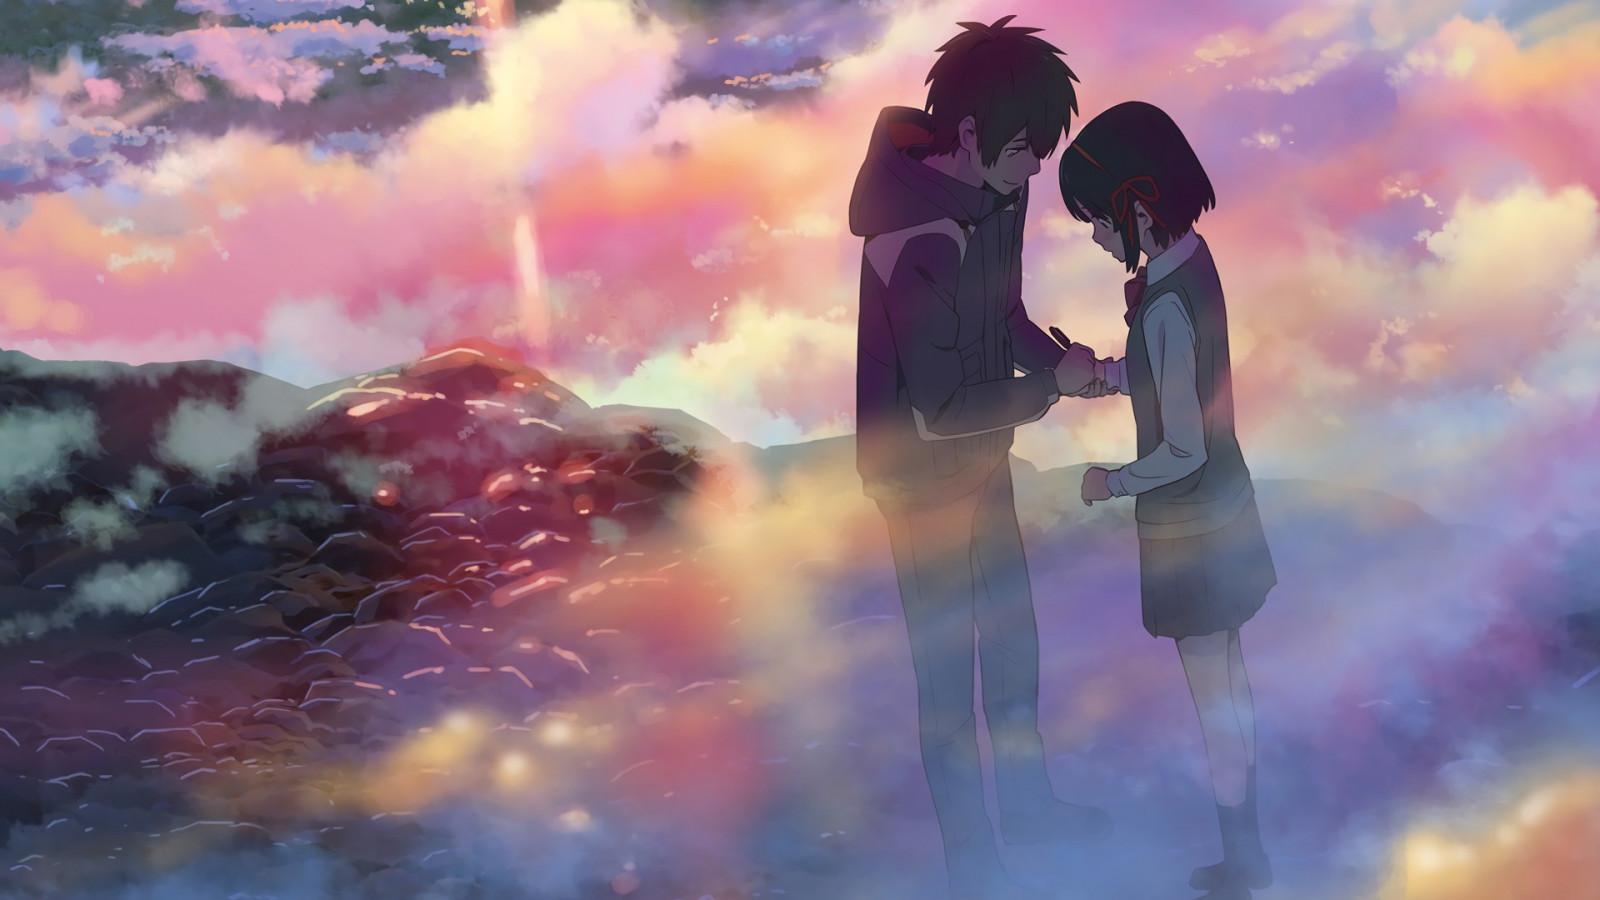 Wallpaper : sunlight, anime, sky, clouds, atmosphere, Kimi ...